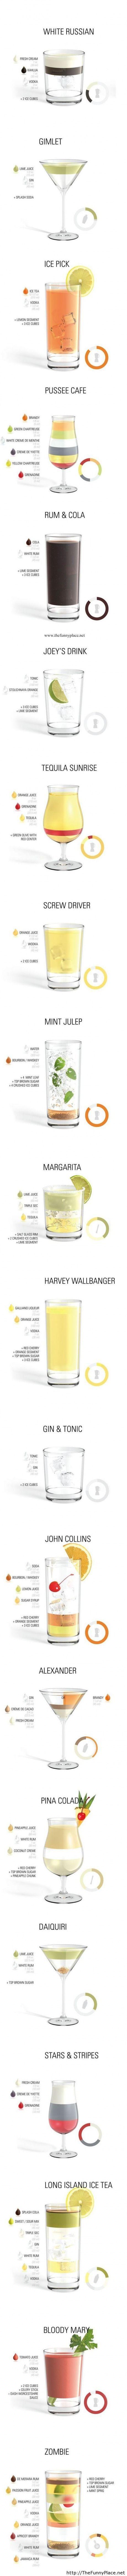 Top 20 cocktails recipes